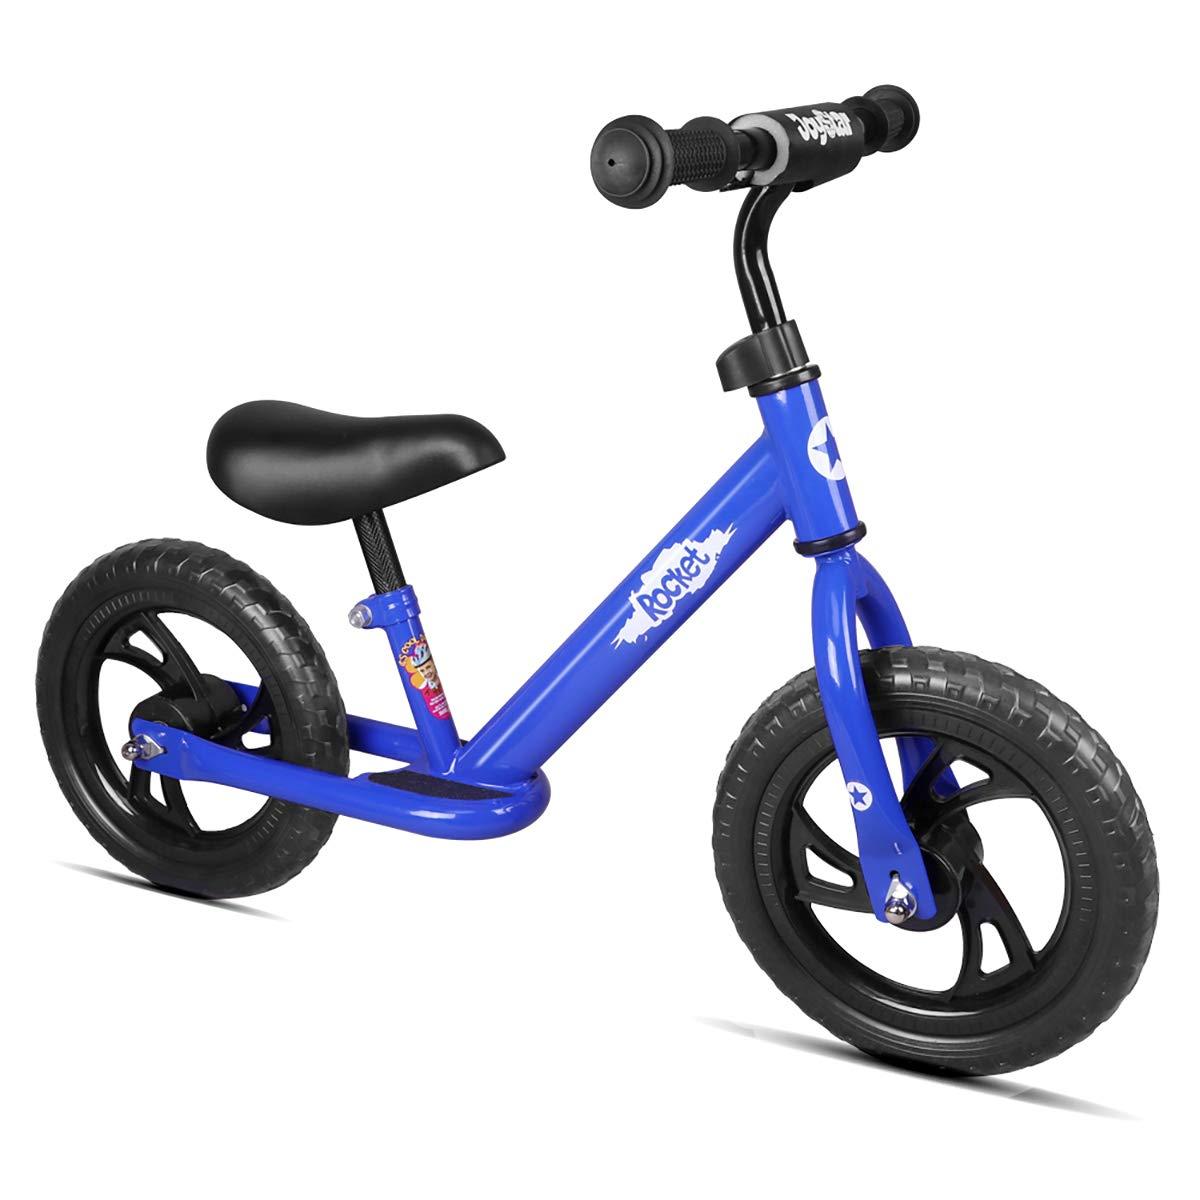 JOYSTAR 12'' Balance Bike for Boys & Girls 1 2 3 4 5 Years Old, Push Bike for Toddlers with Footboard and Handlebar Protect Pad, Kids Glider Bike, Blue